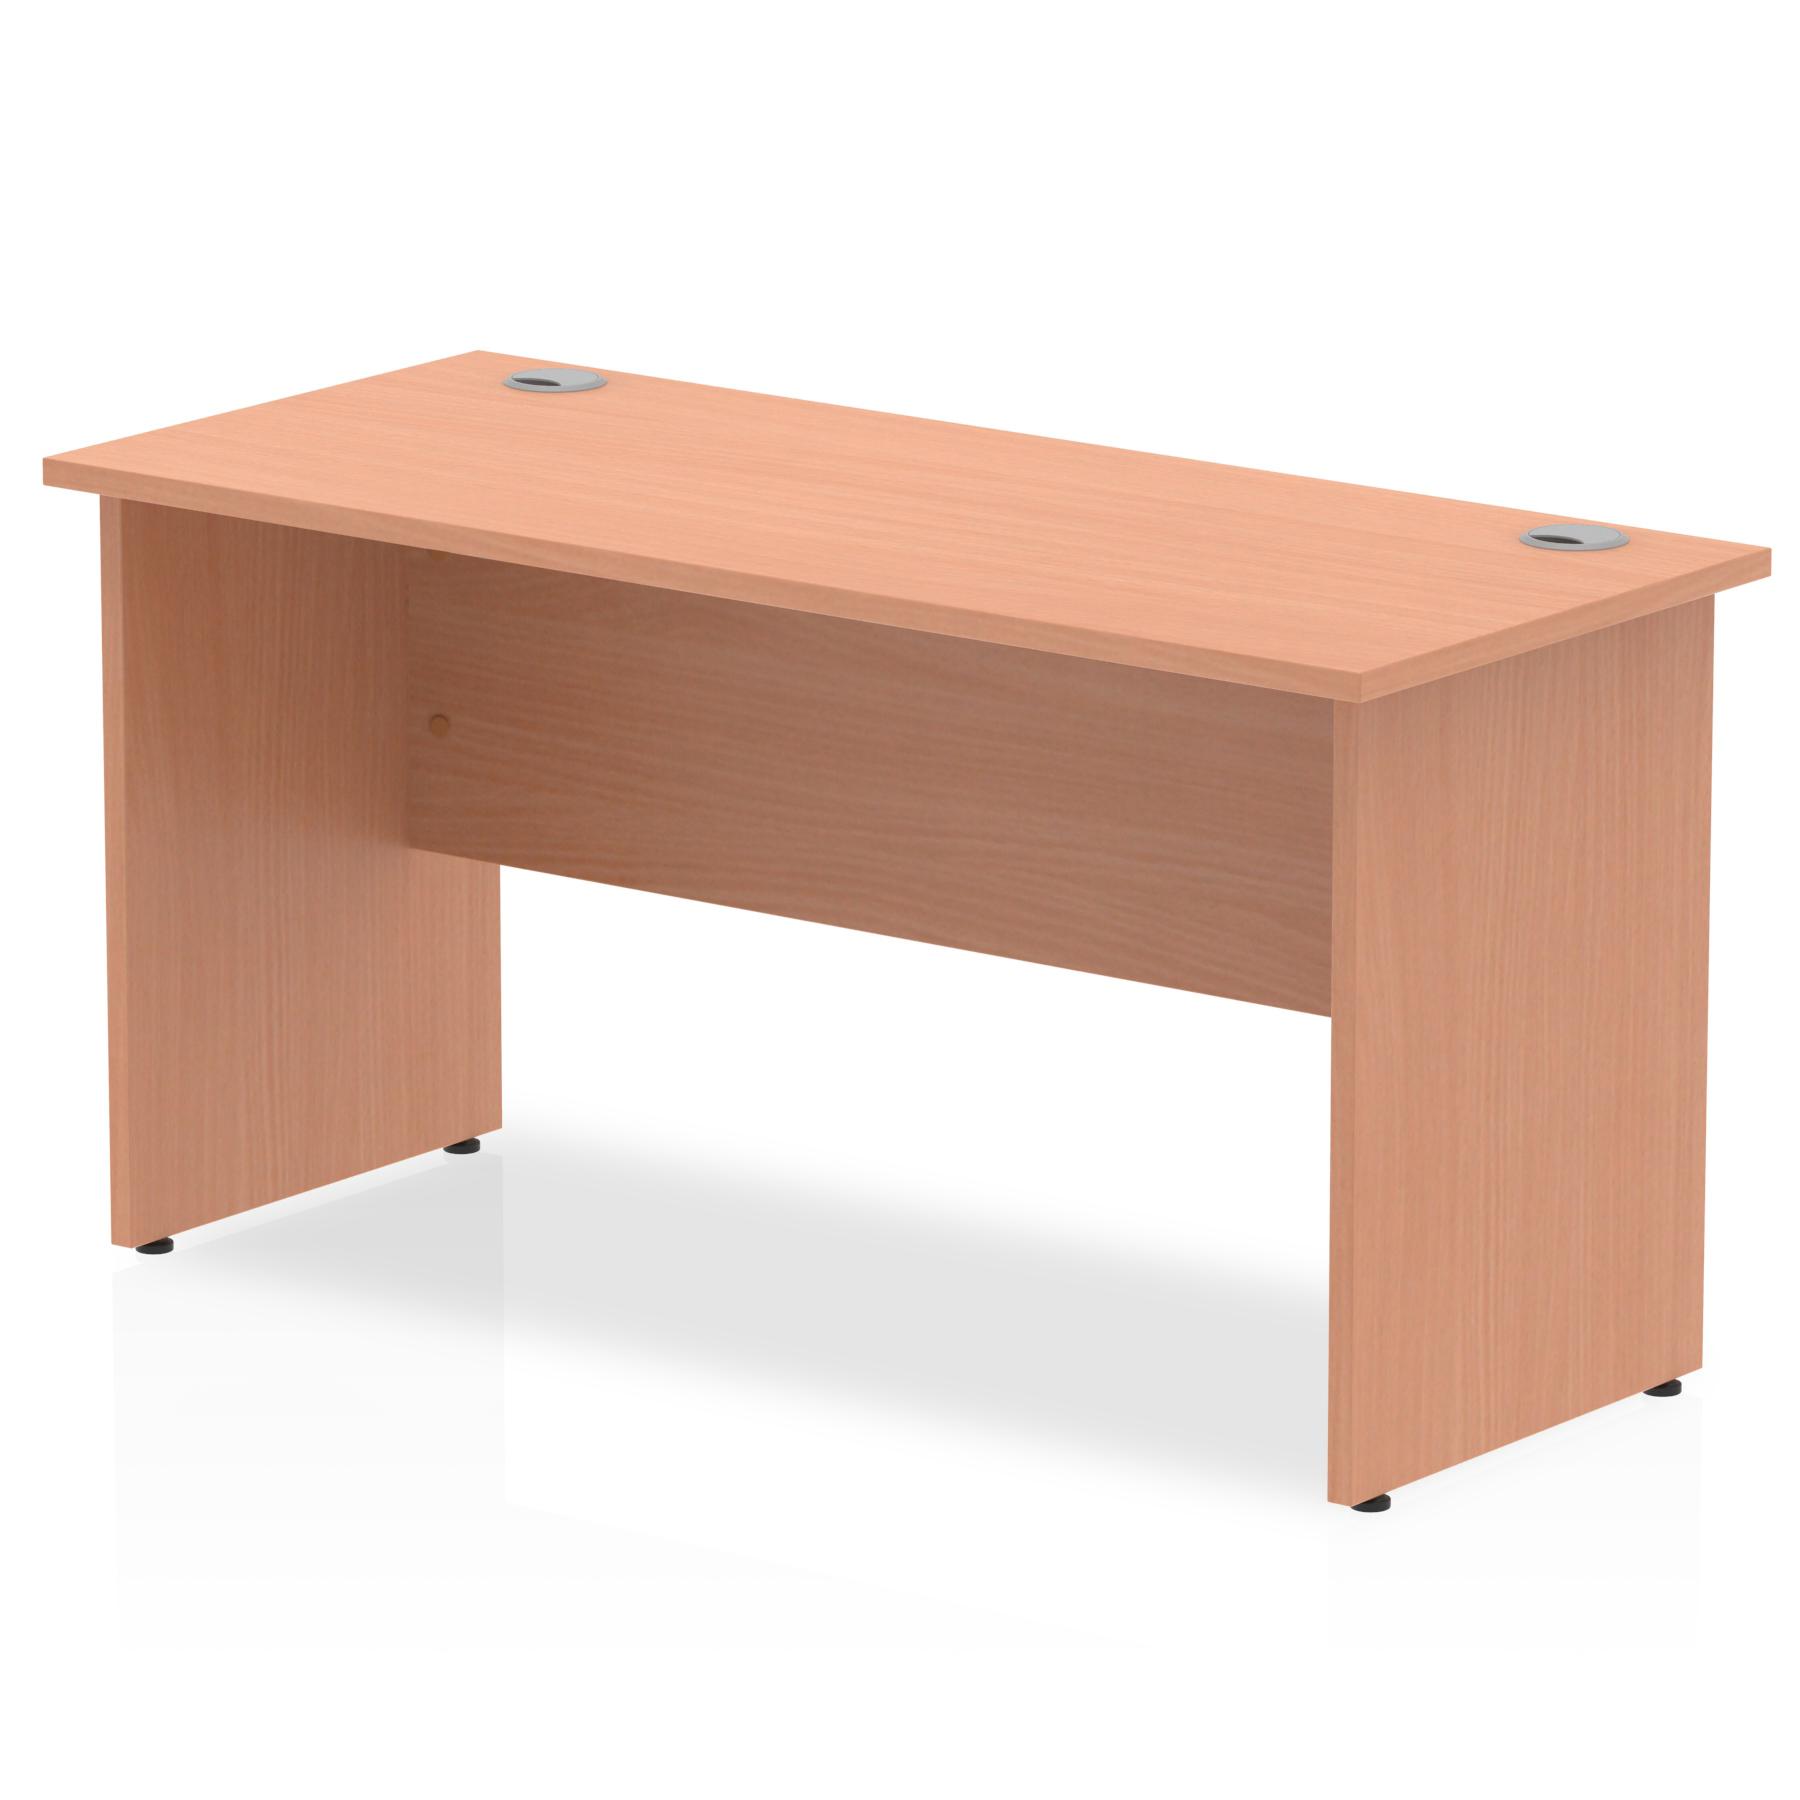 Trexus Desk Rectangle Panel End Leg 1400x600mm Beech Ref MI001730